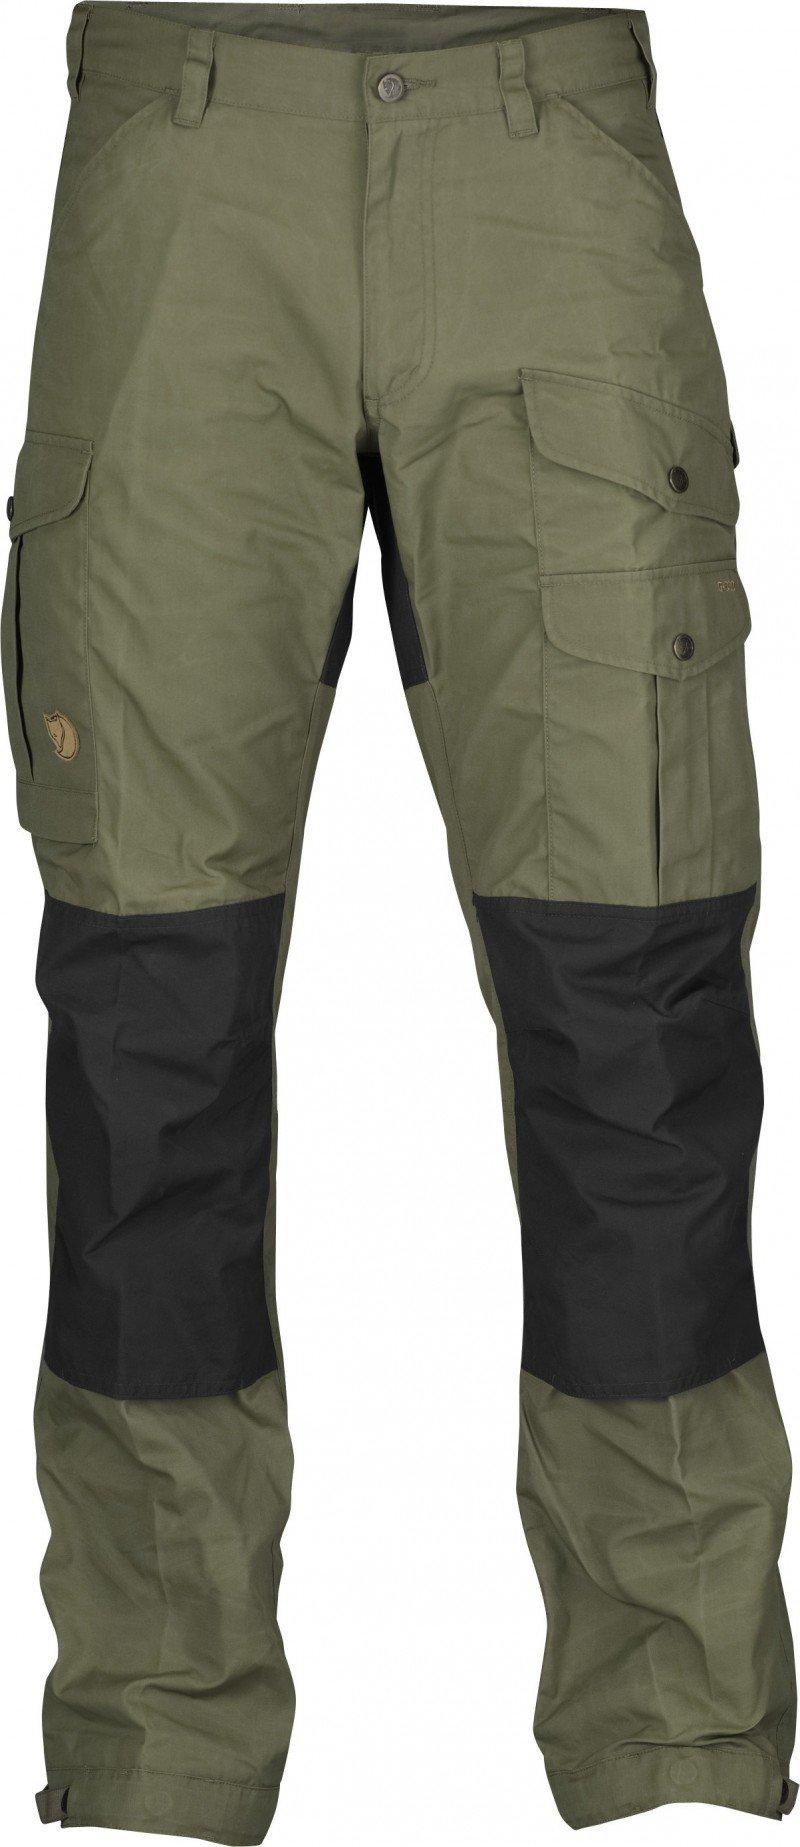 Vidda Pro Trekking Trousers